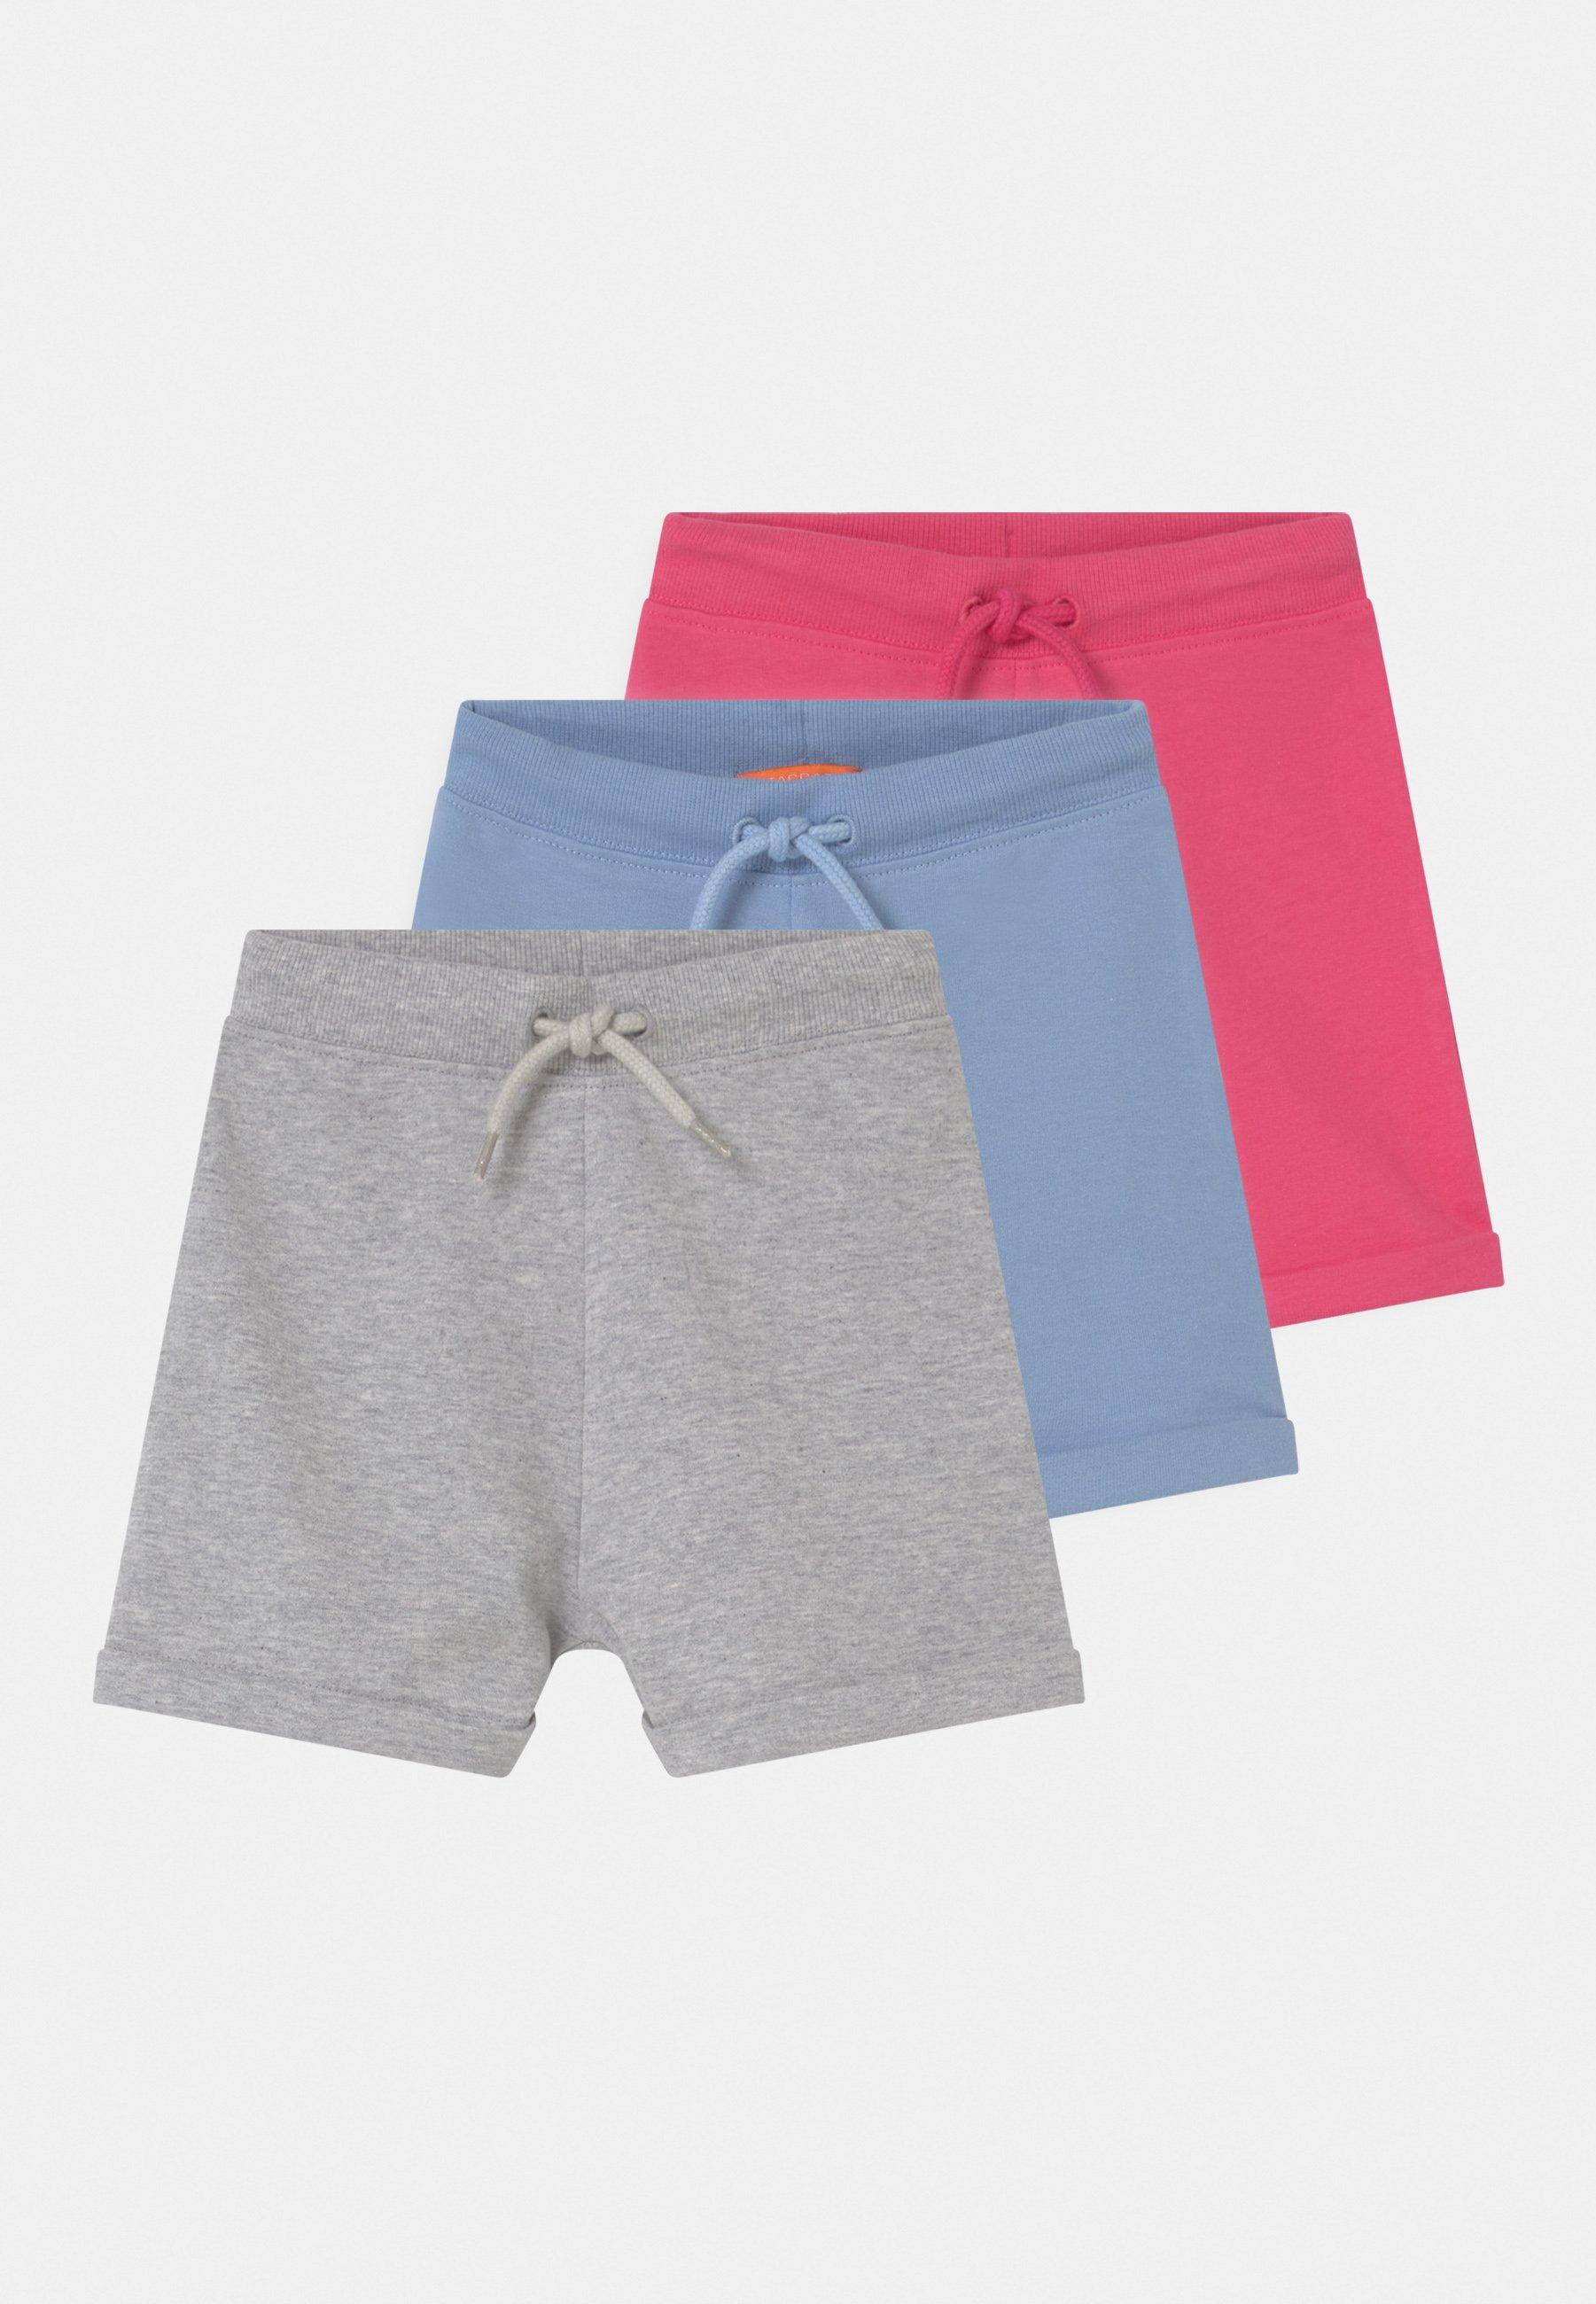 Enfant GIRLS KID 3 PACK - Short